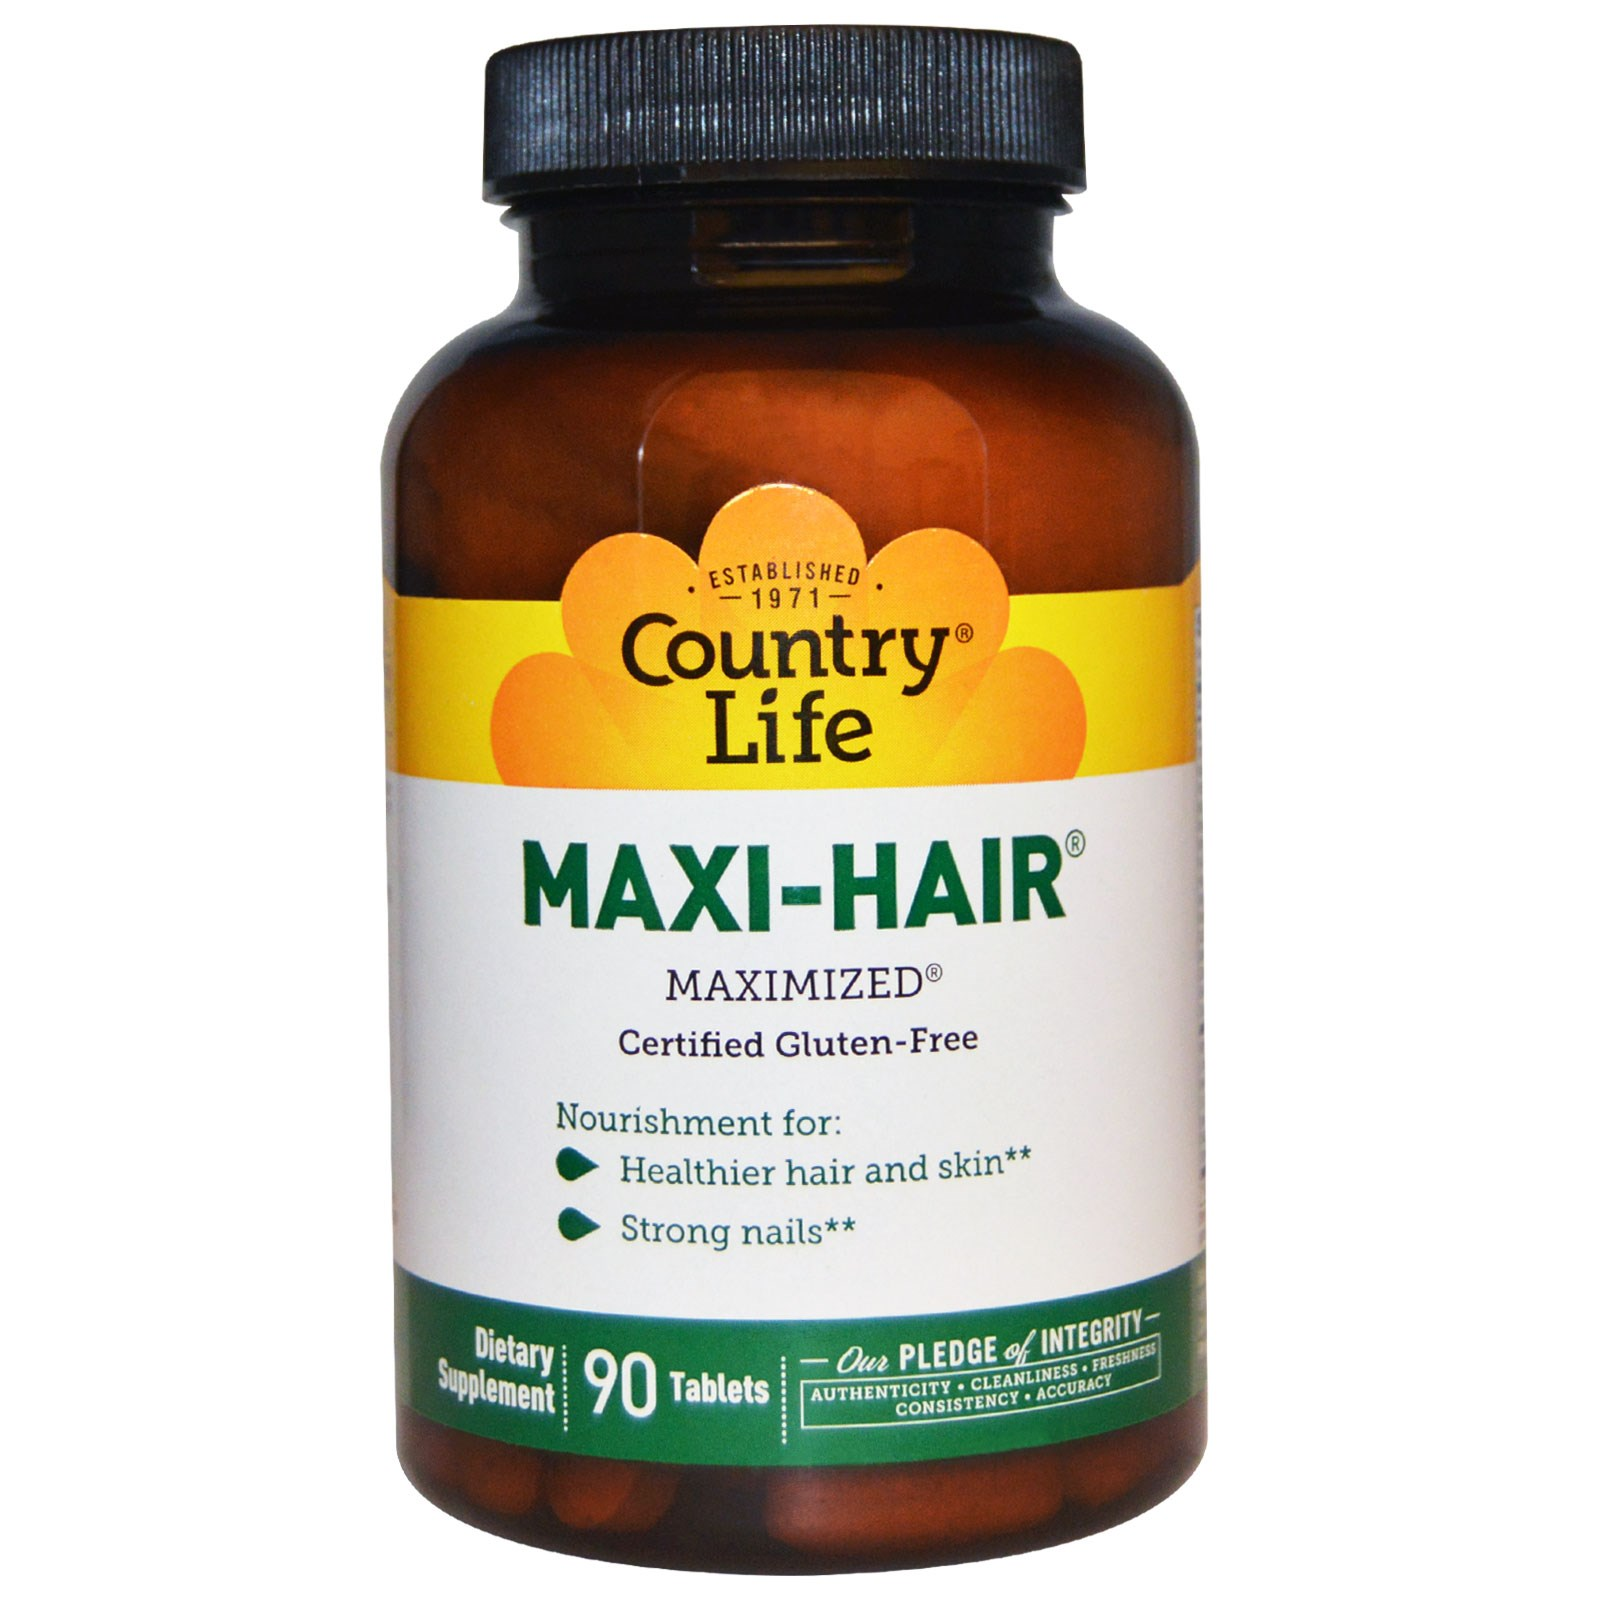 Комплекс Maxi-Hair от Country Life в таблетках (90 штук)